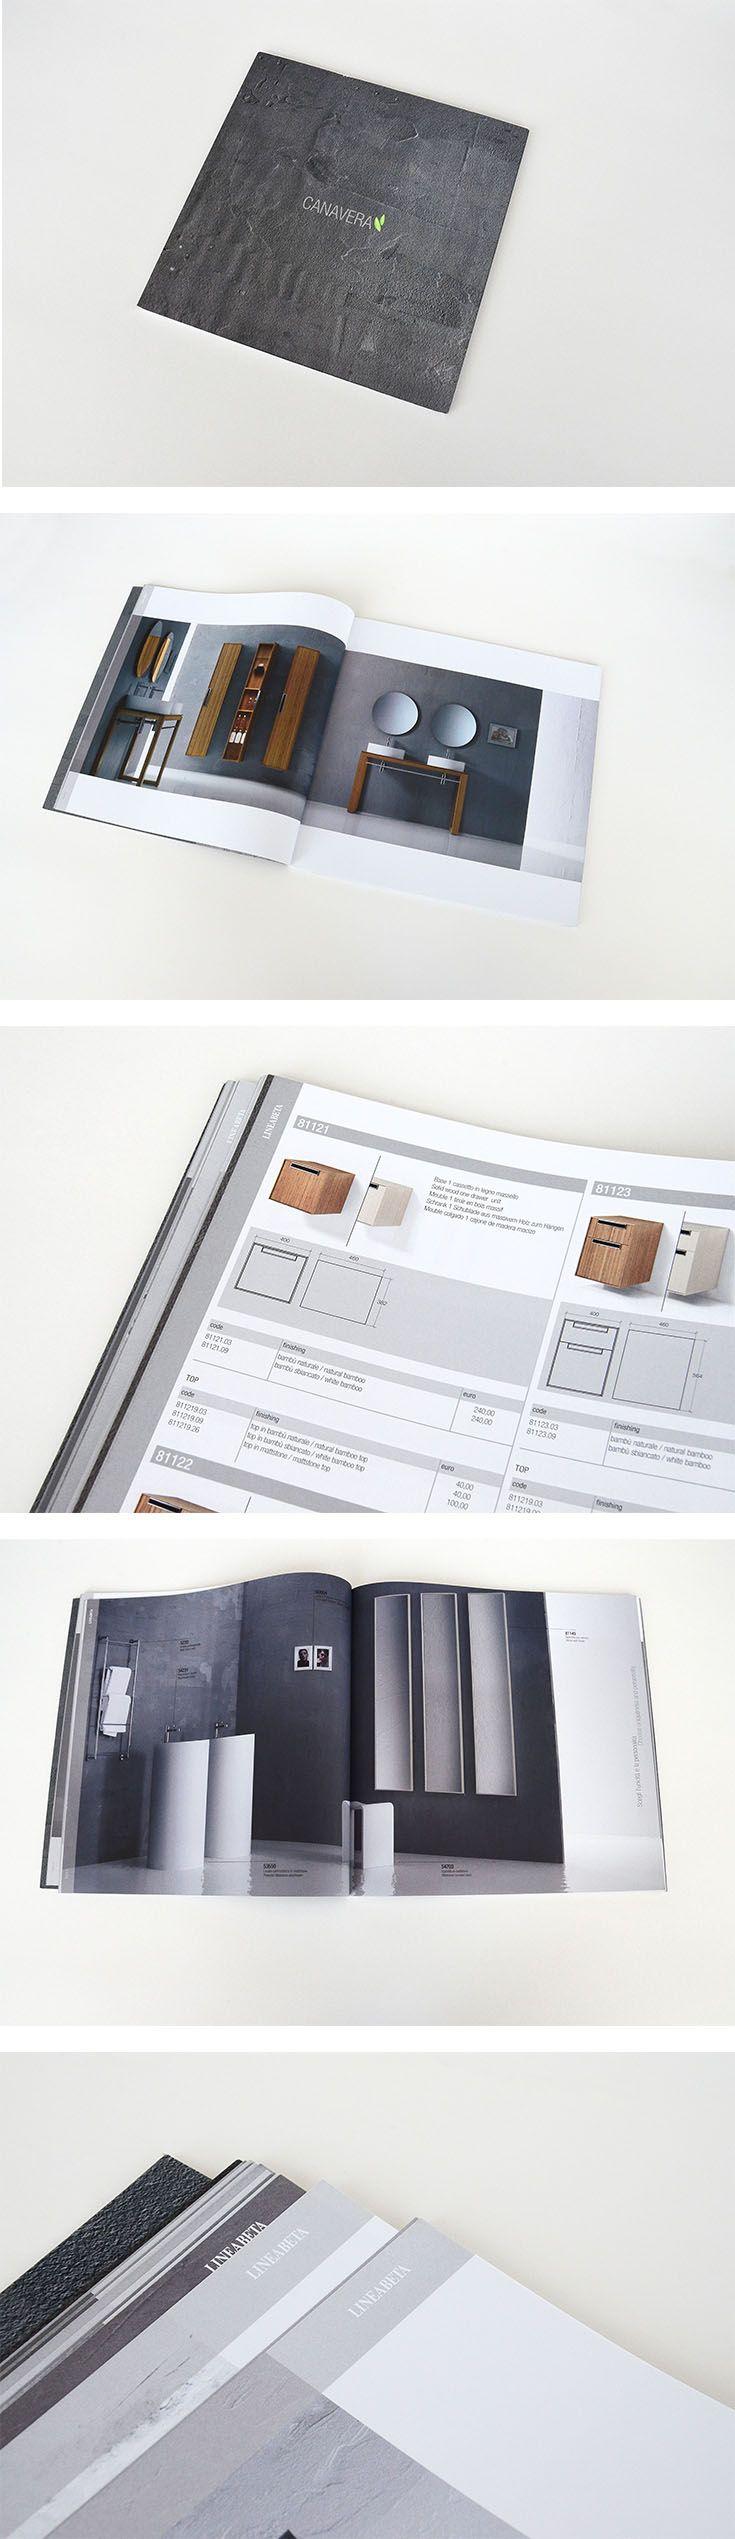 Lineabeta cataloghi, un progetto #effADV - Lineabeta #printing, effADV project - #catalogue #print